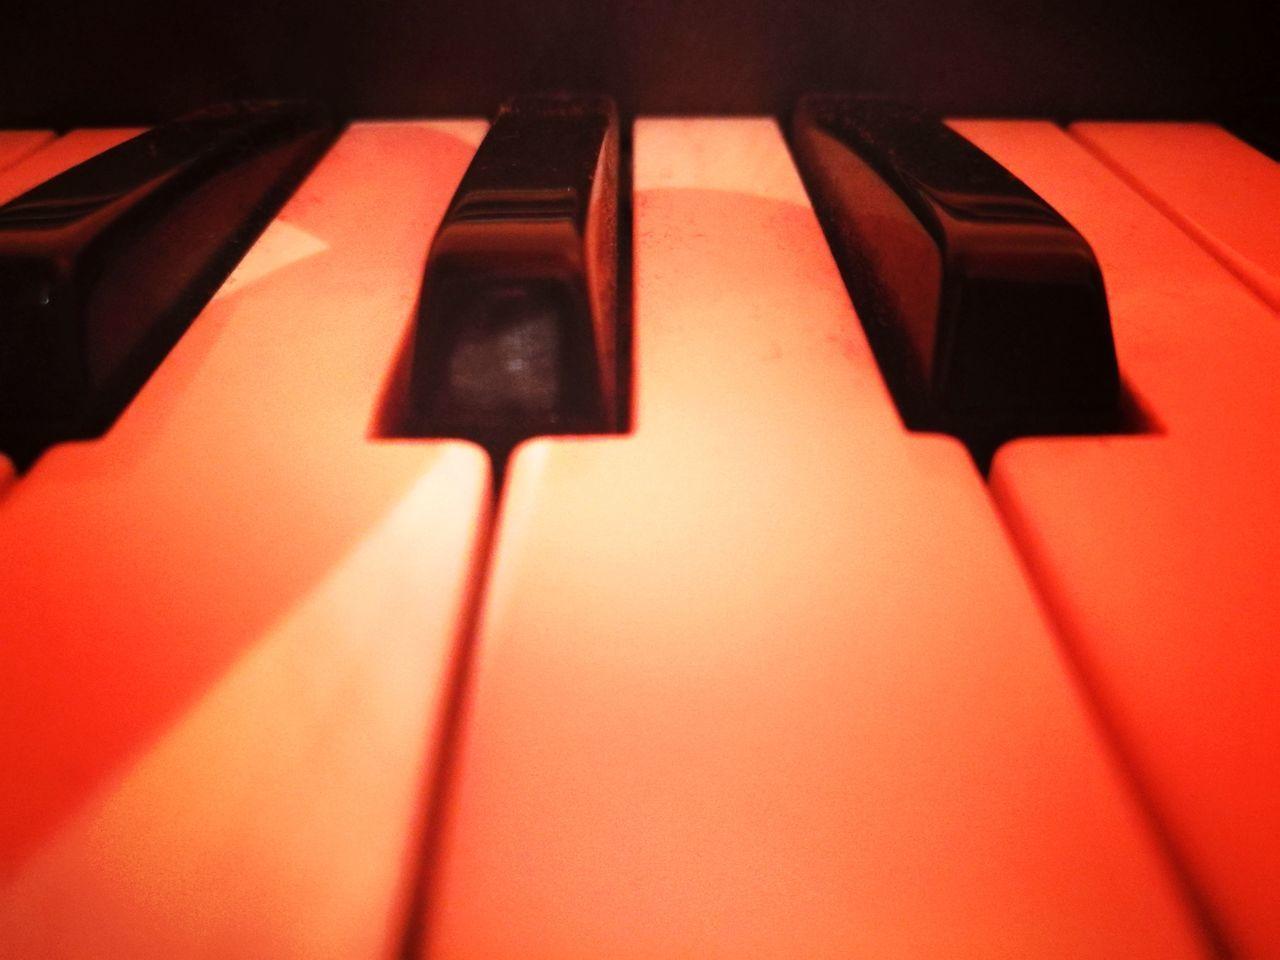 Piano. Piano Moments Piano Time Piano Music Enhance Songs